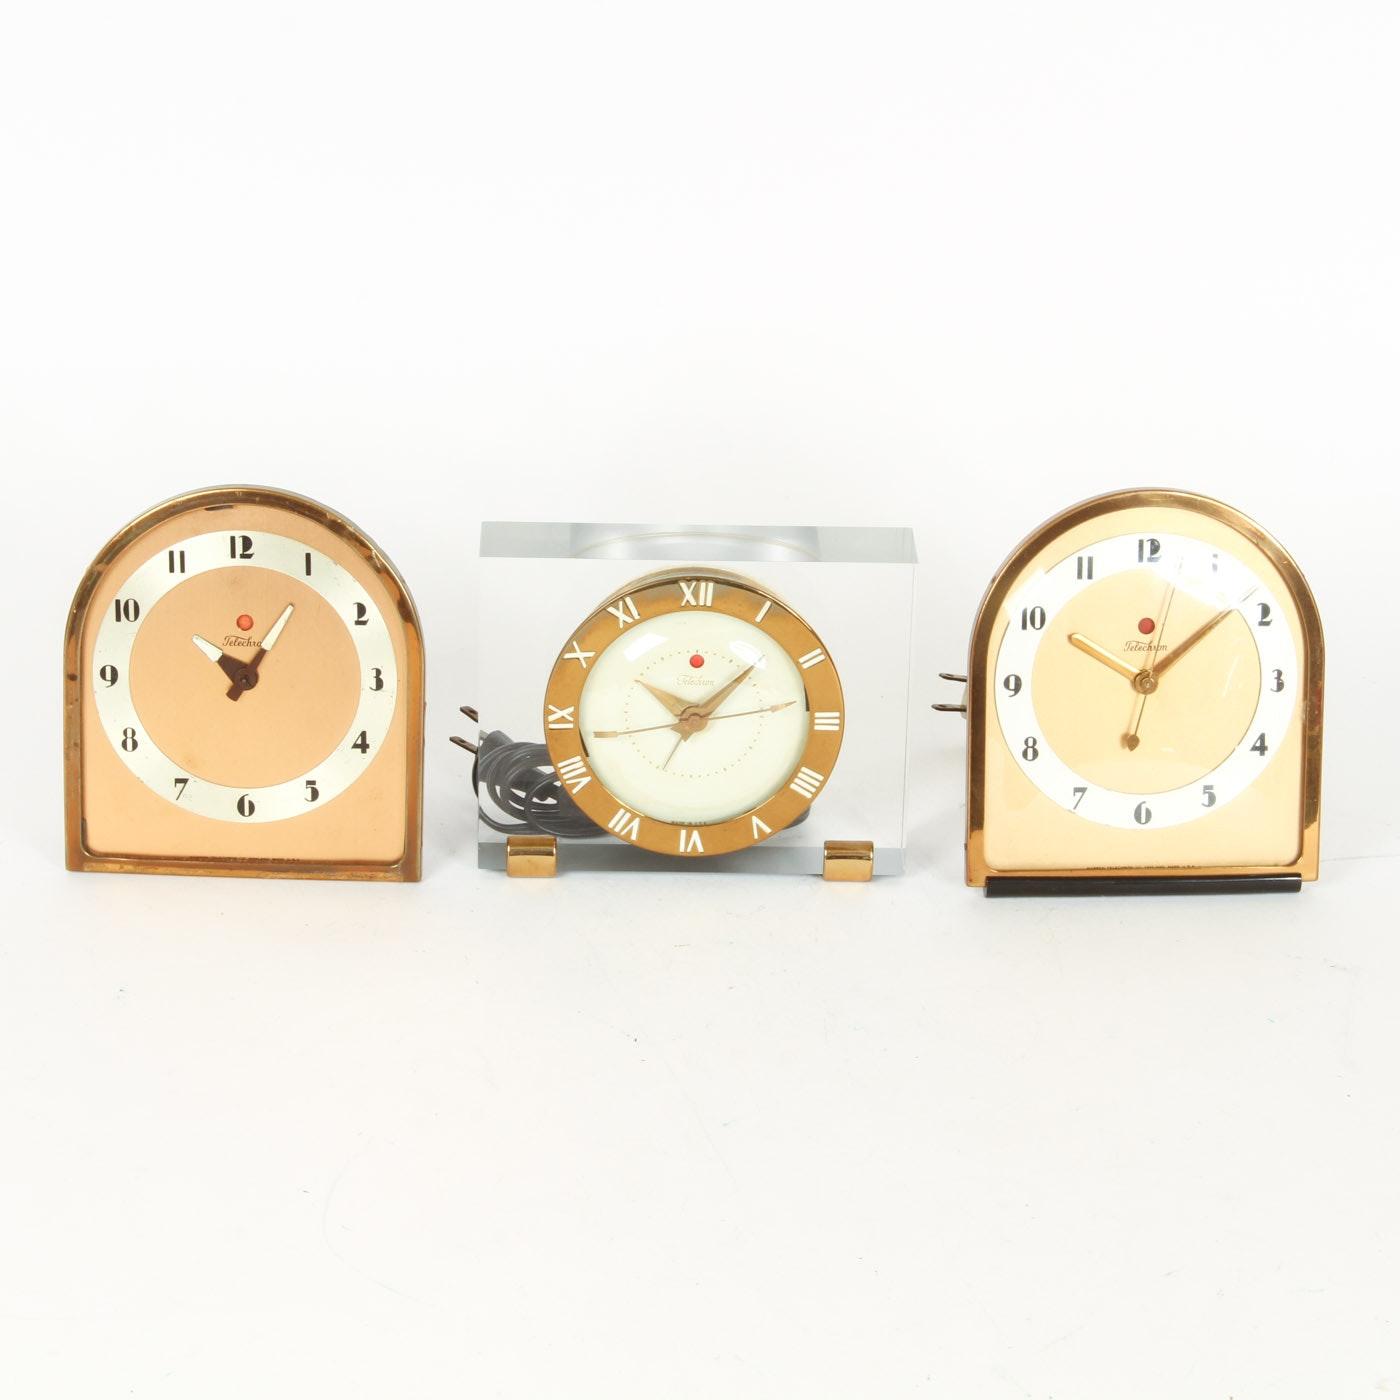 Collection of Three Vintage Telechron Mantel Clocks